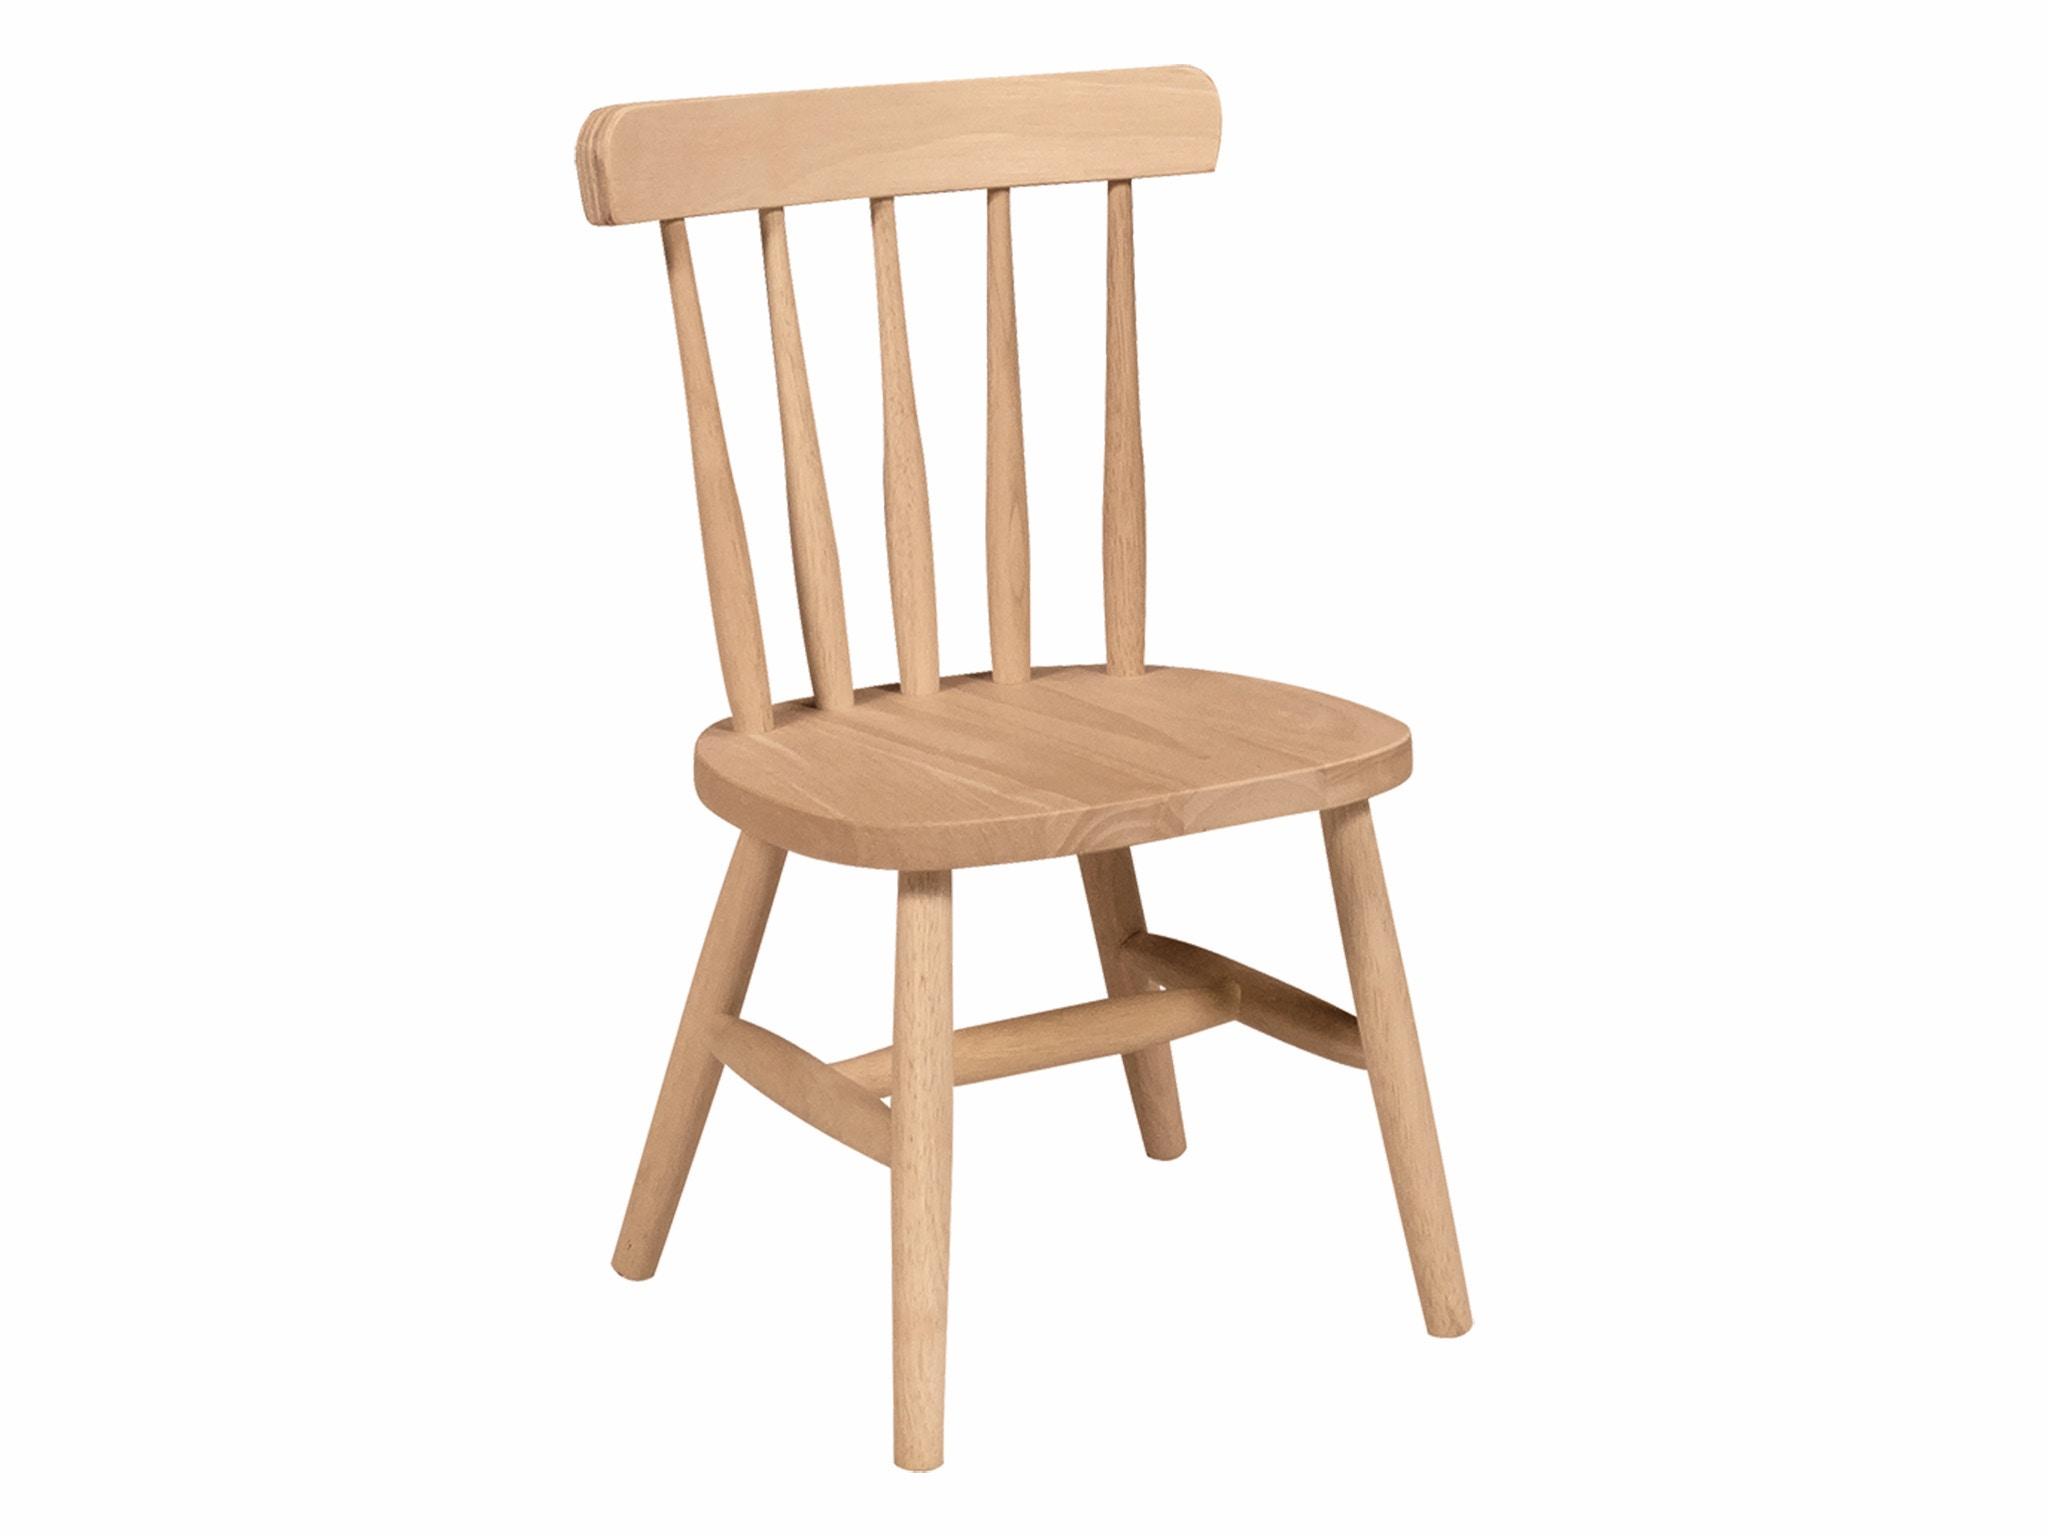 1124. Totu0027s Chair